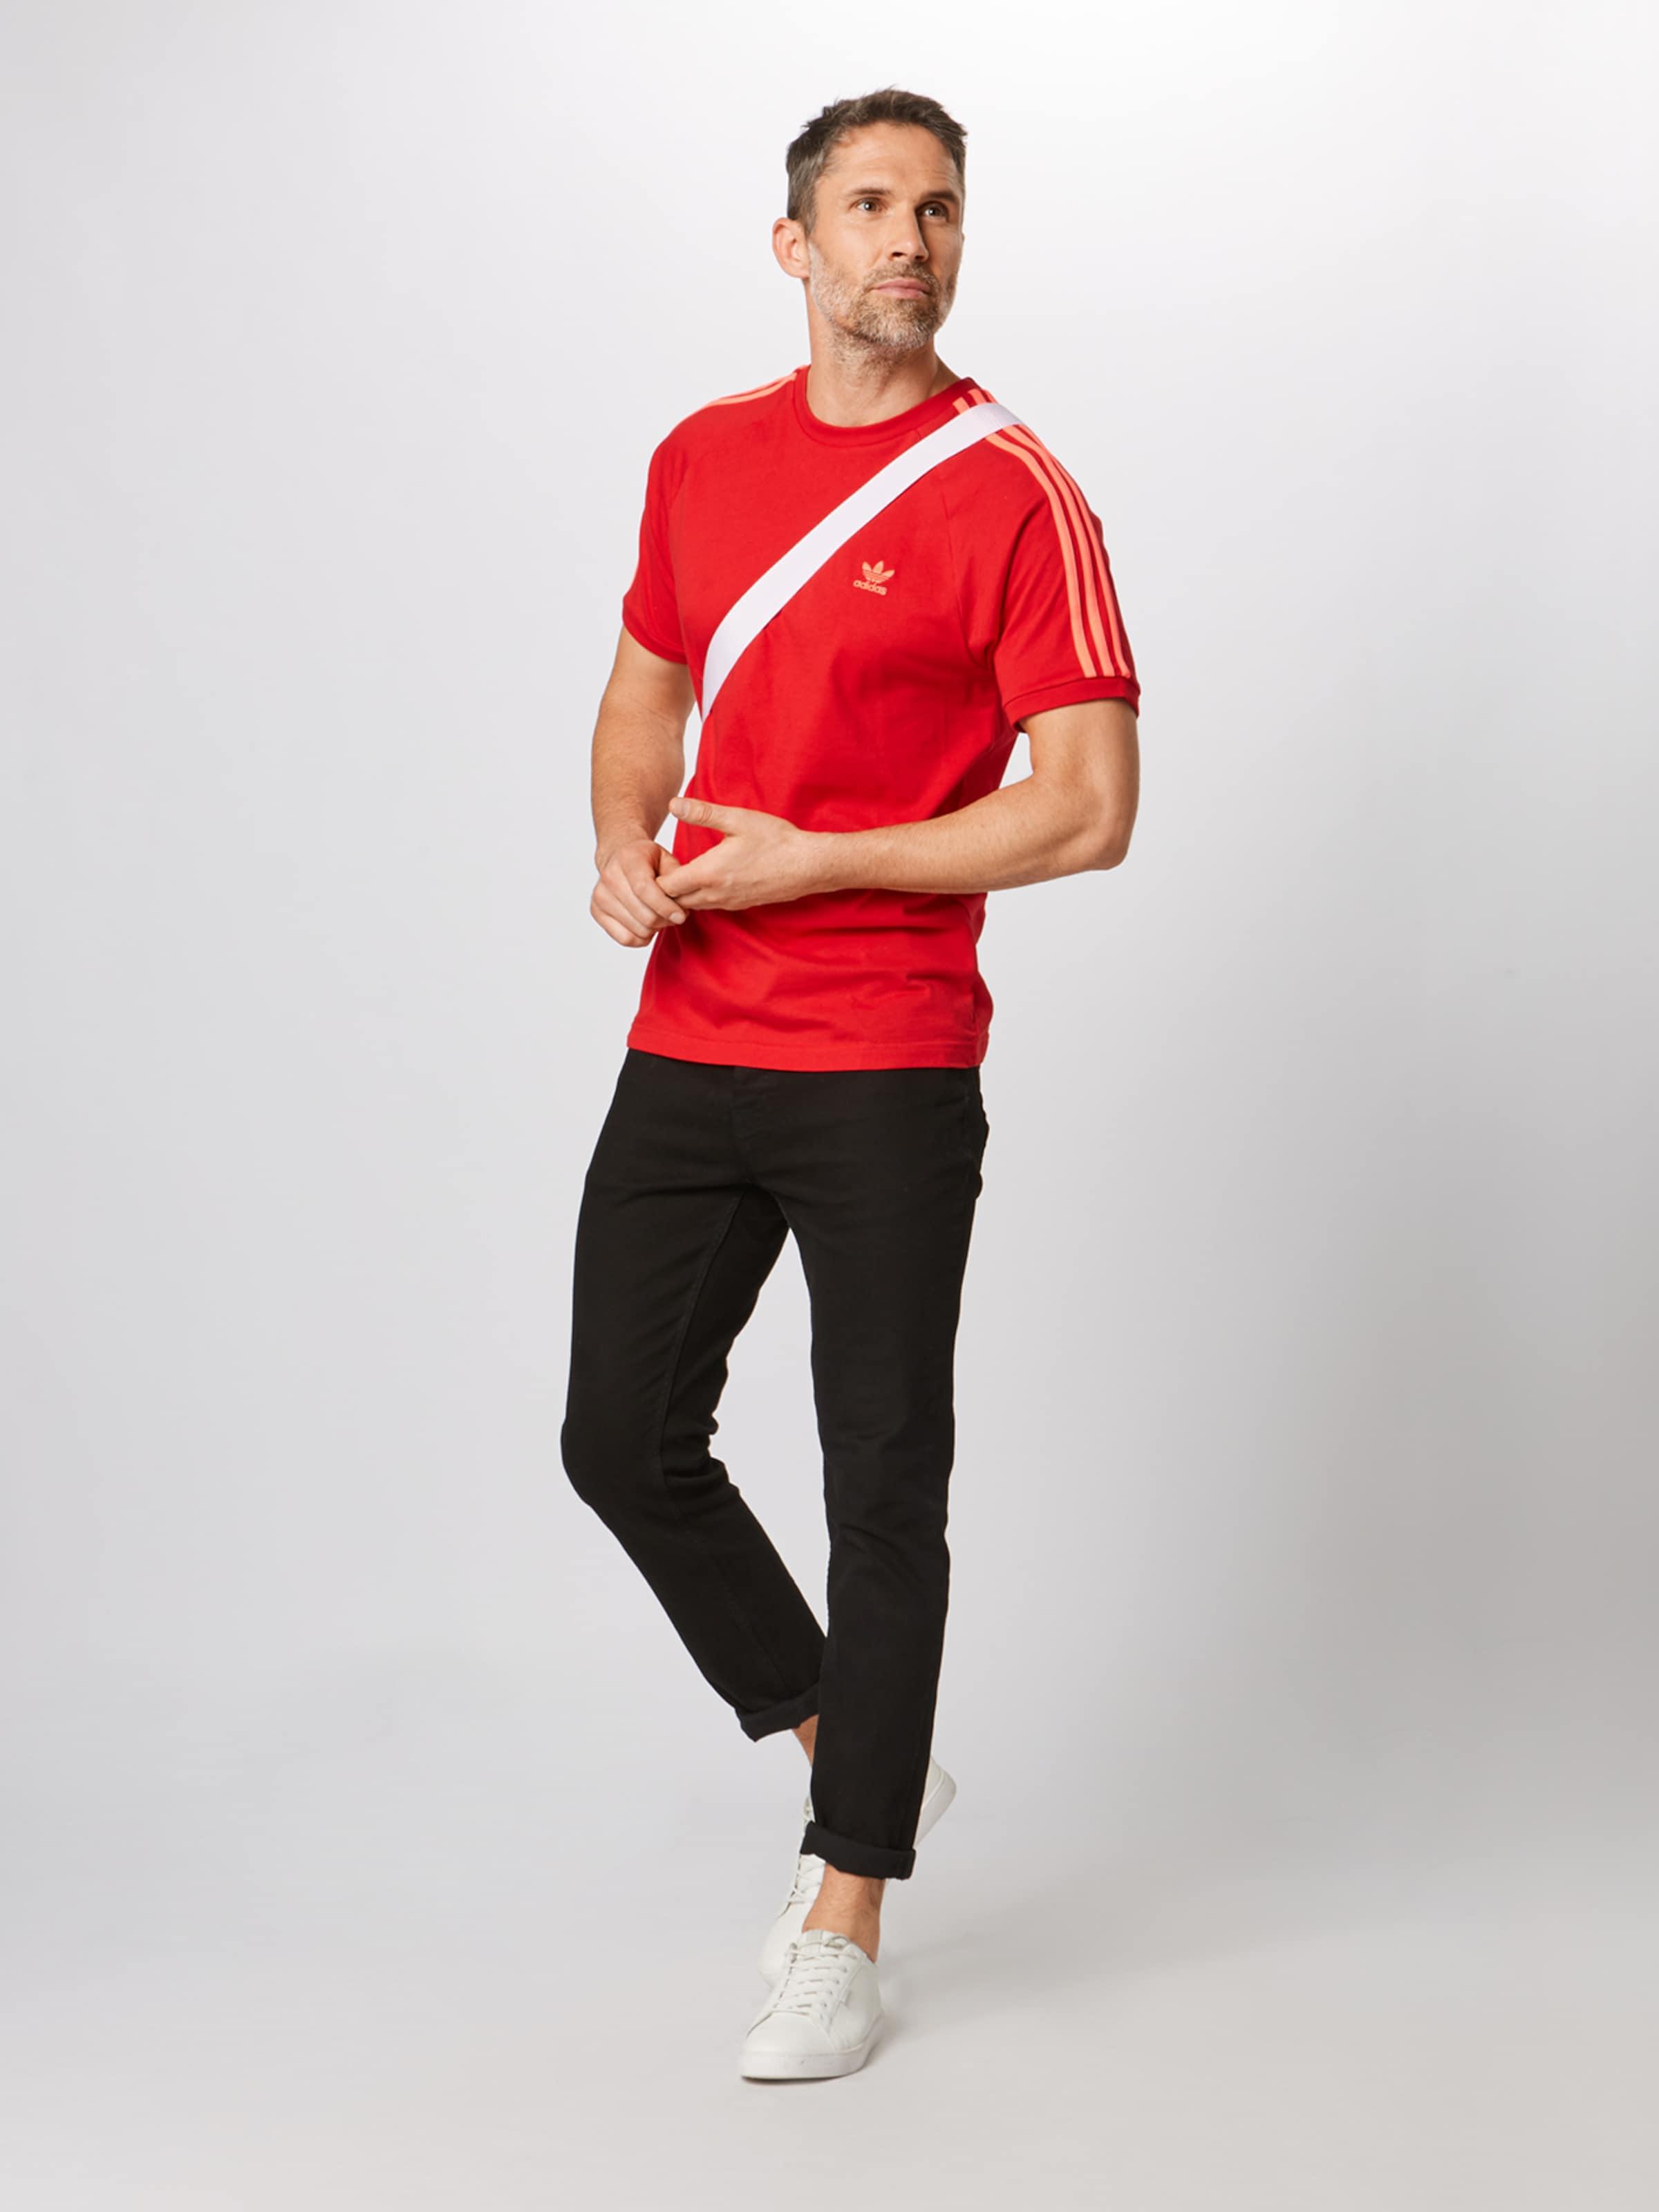 Originals Adidas shirt In T Rot roxBeCd